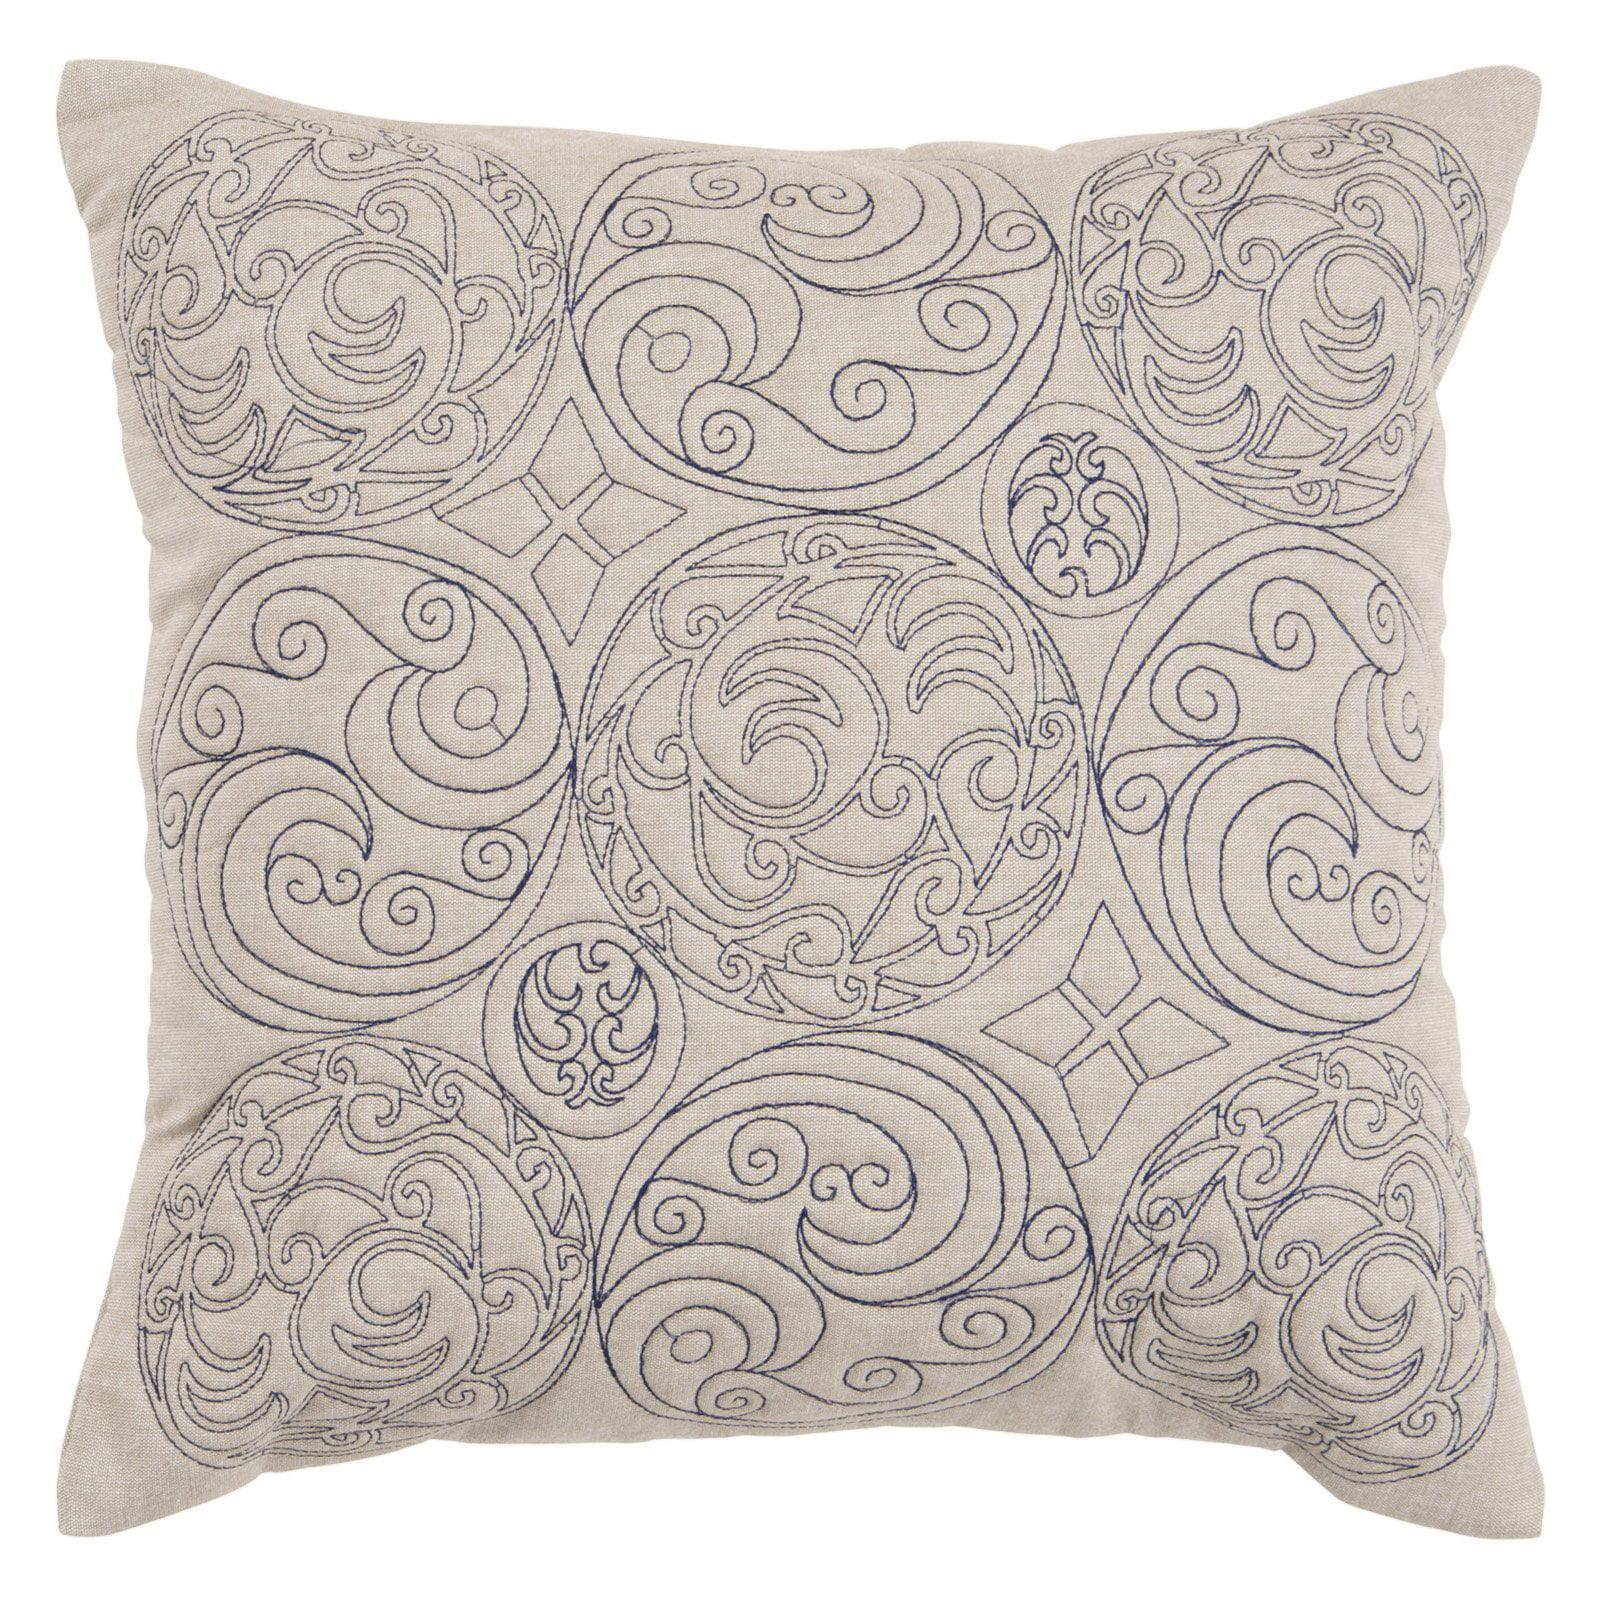 Surya Ornaments Decorative Pillow - Beige